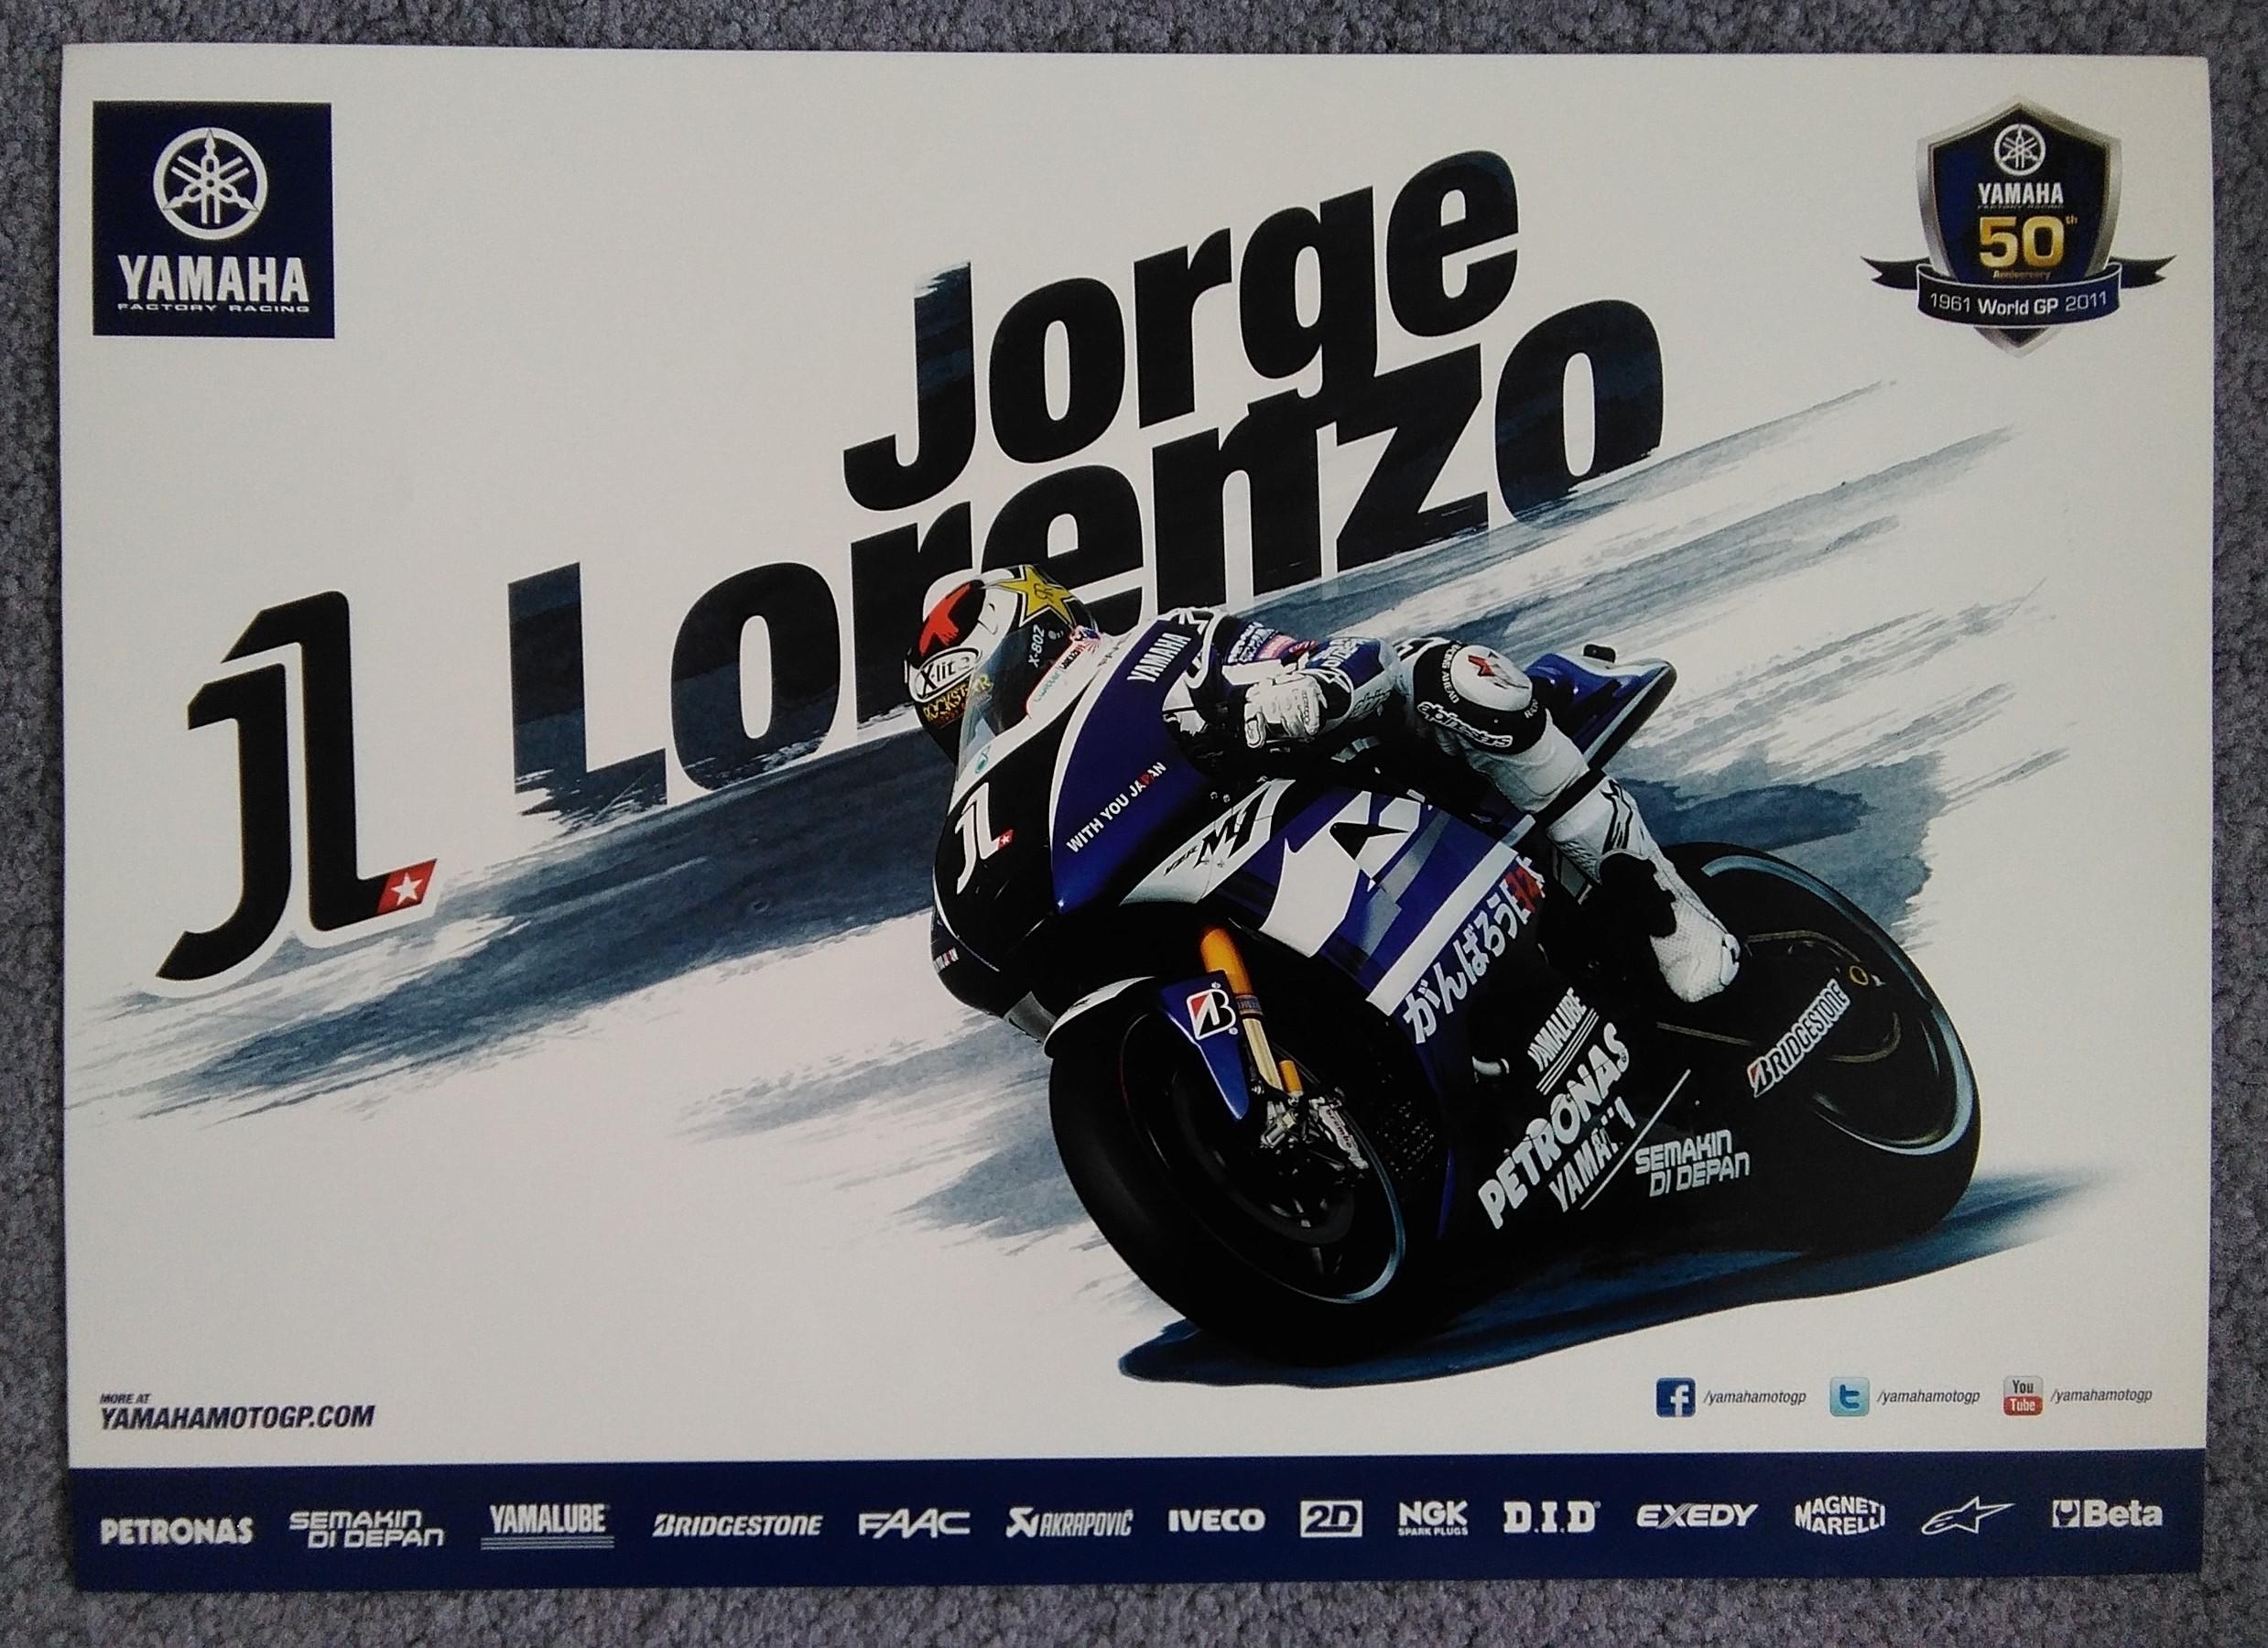 Jorge Lorenzo Yamaha 50th Poster